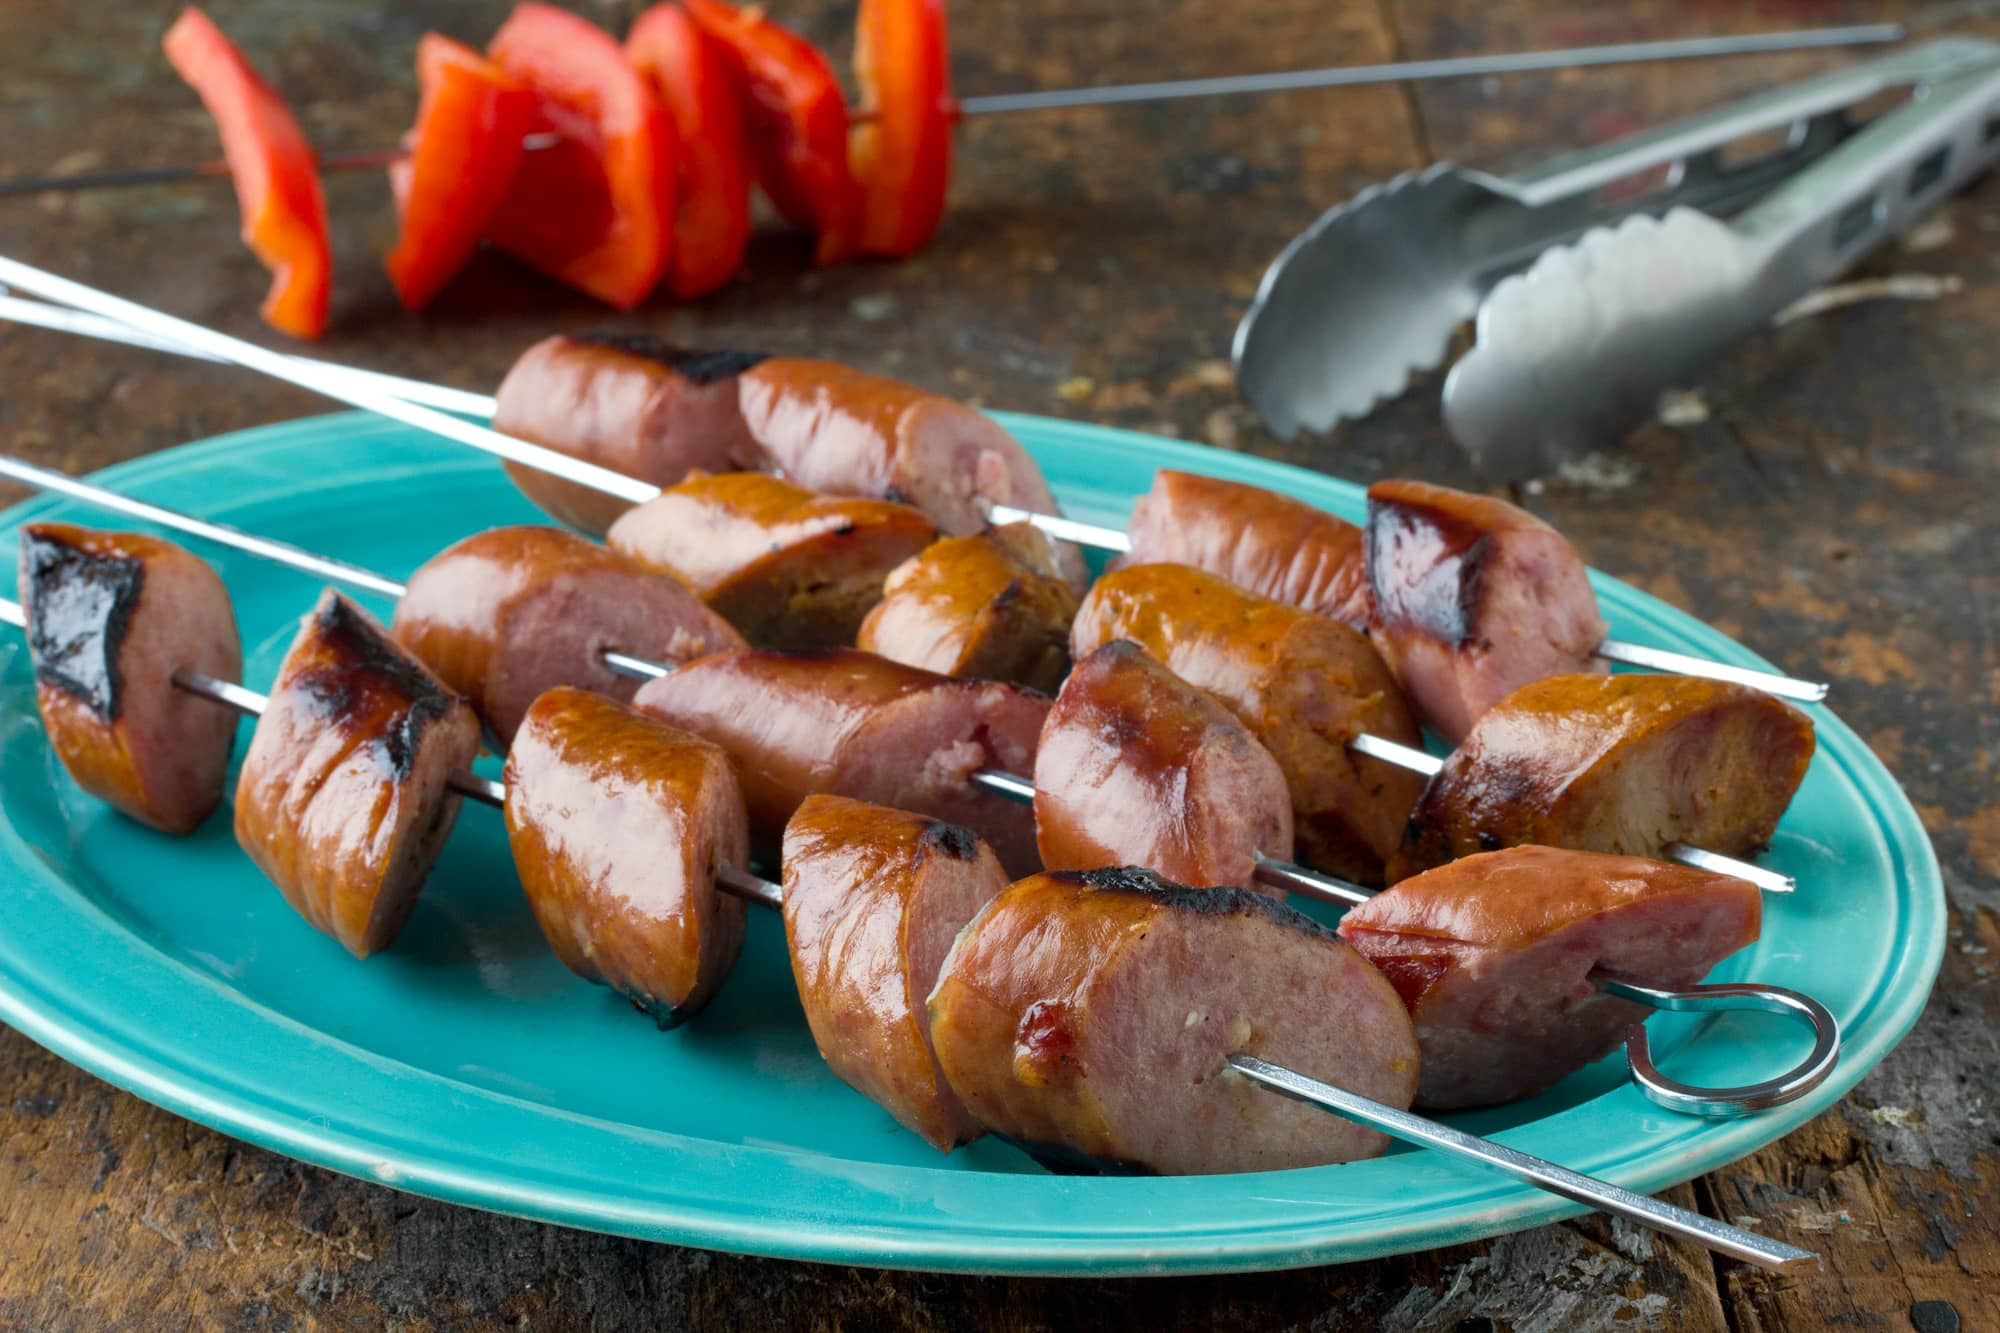 Recipe: Grilled Smoked Sausage Skewers